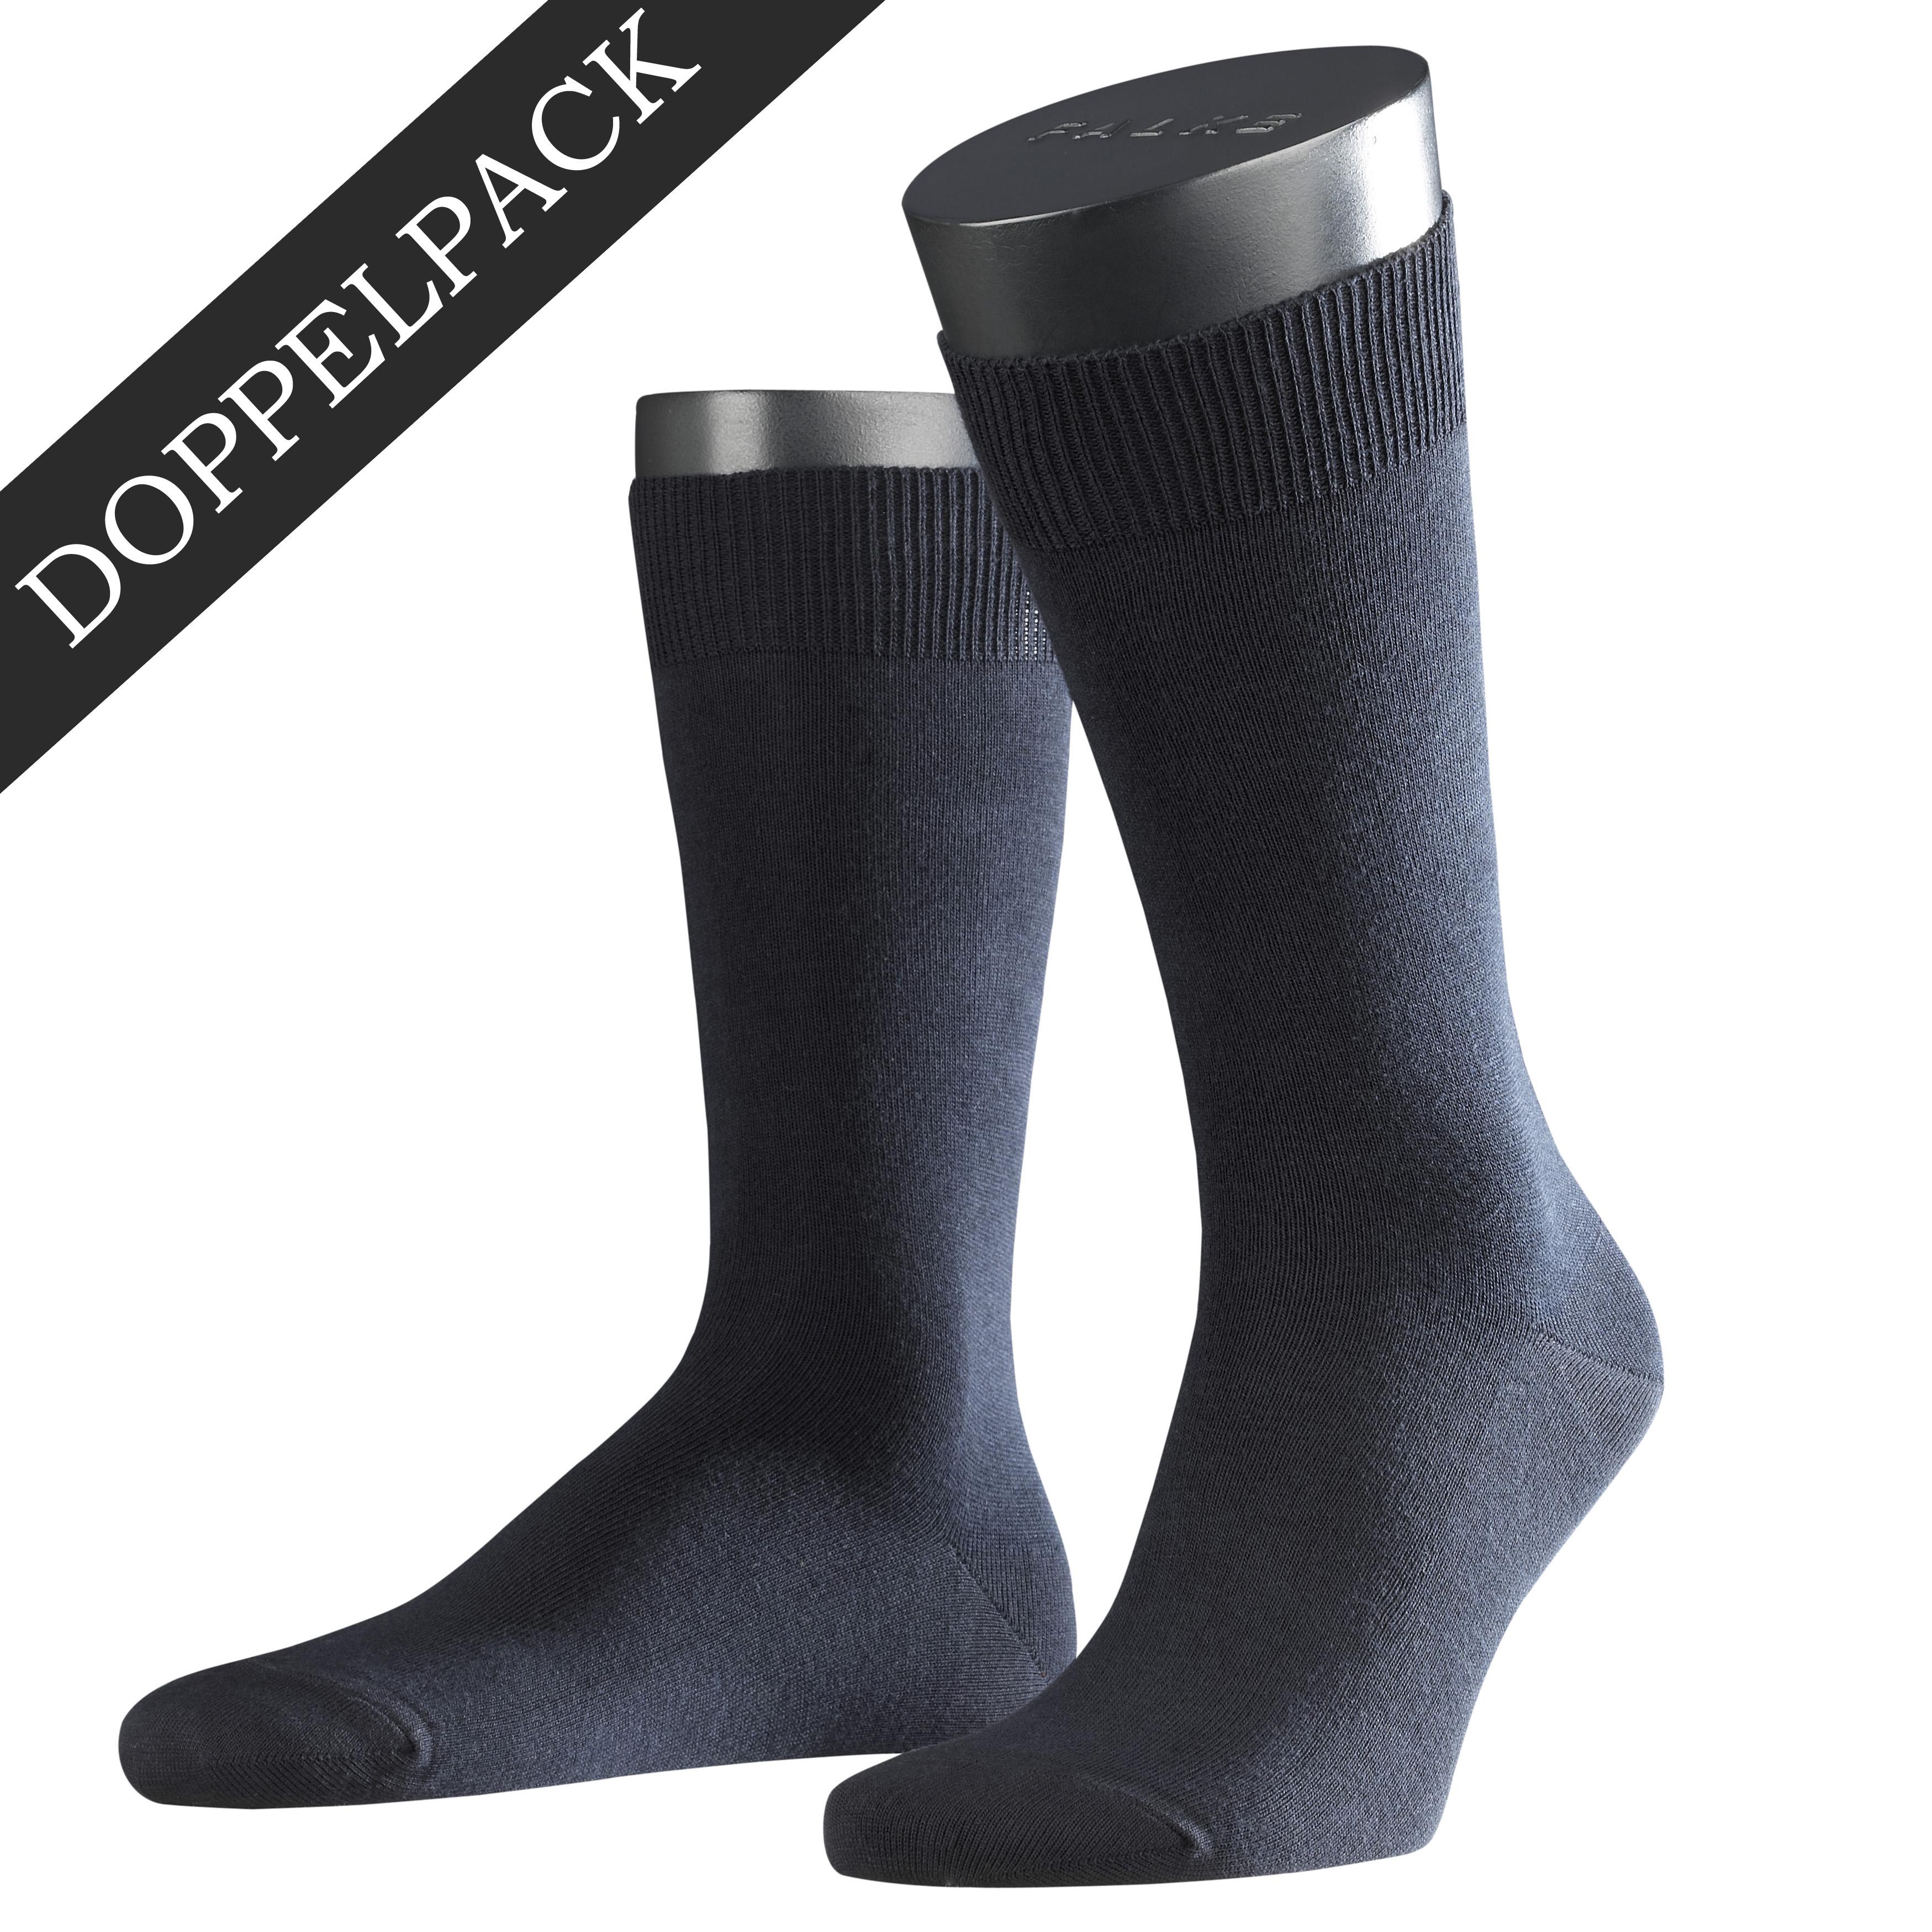 Falke Doppelpack Socke Swing marine blau 14633 - 6370 Basic Baumwolle